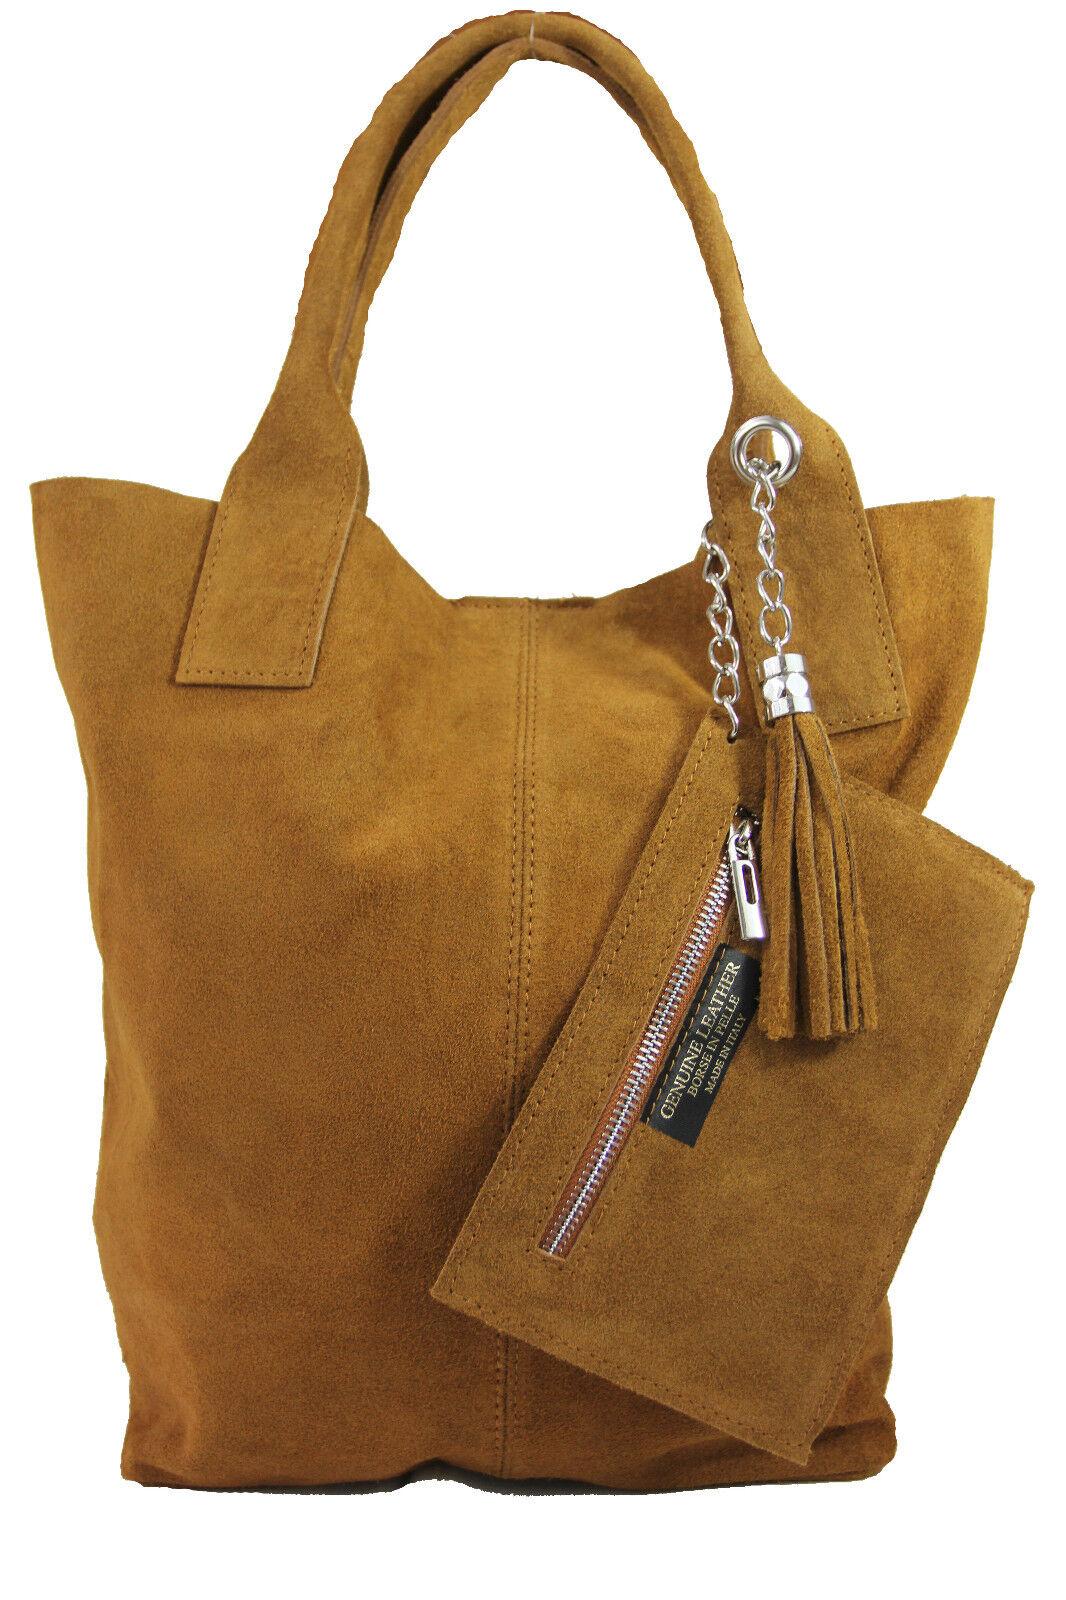 Ital.Henkeltasche Beuteltasche Shopper XXL Damentasche cognac Wildleder      | Outlet Store Online  483389